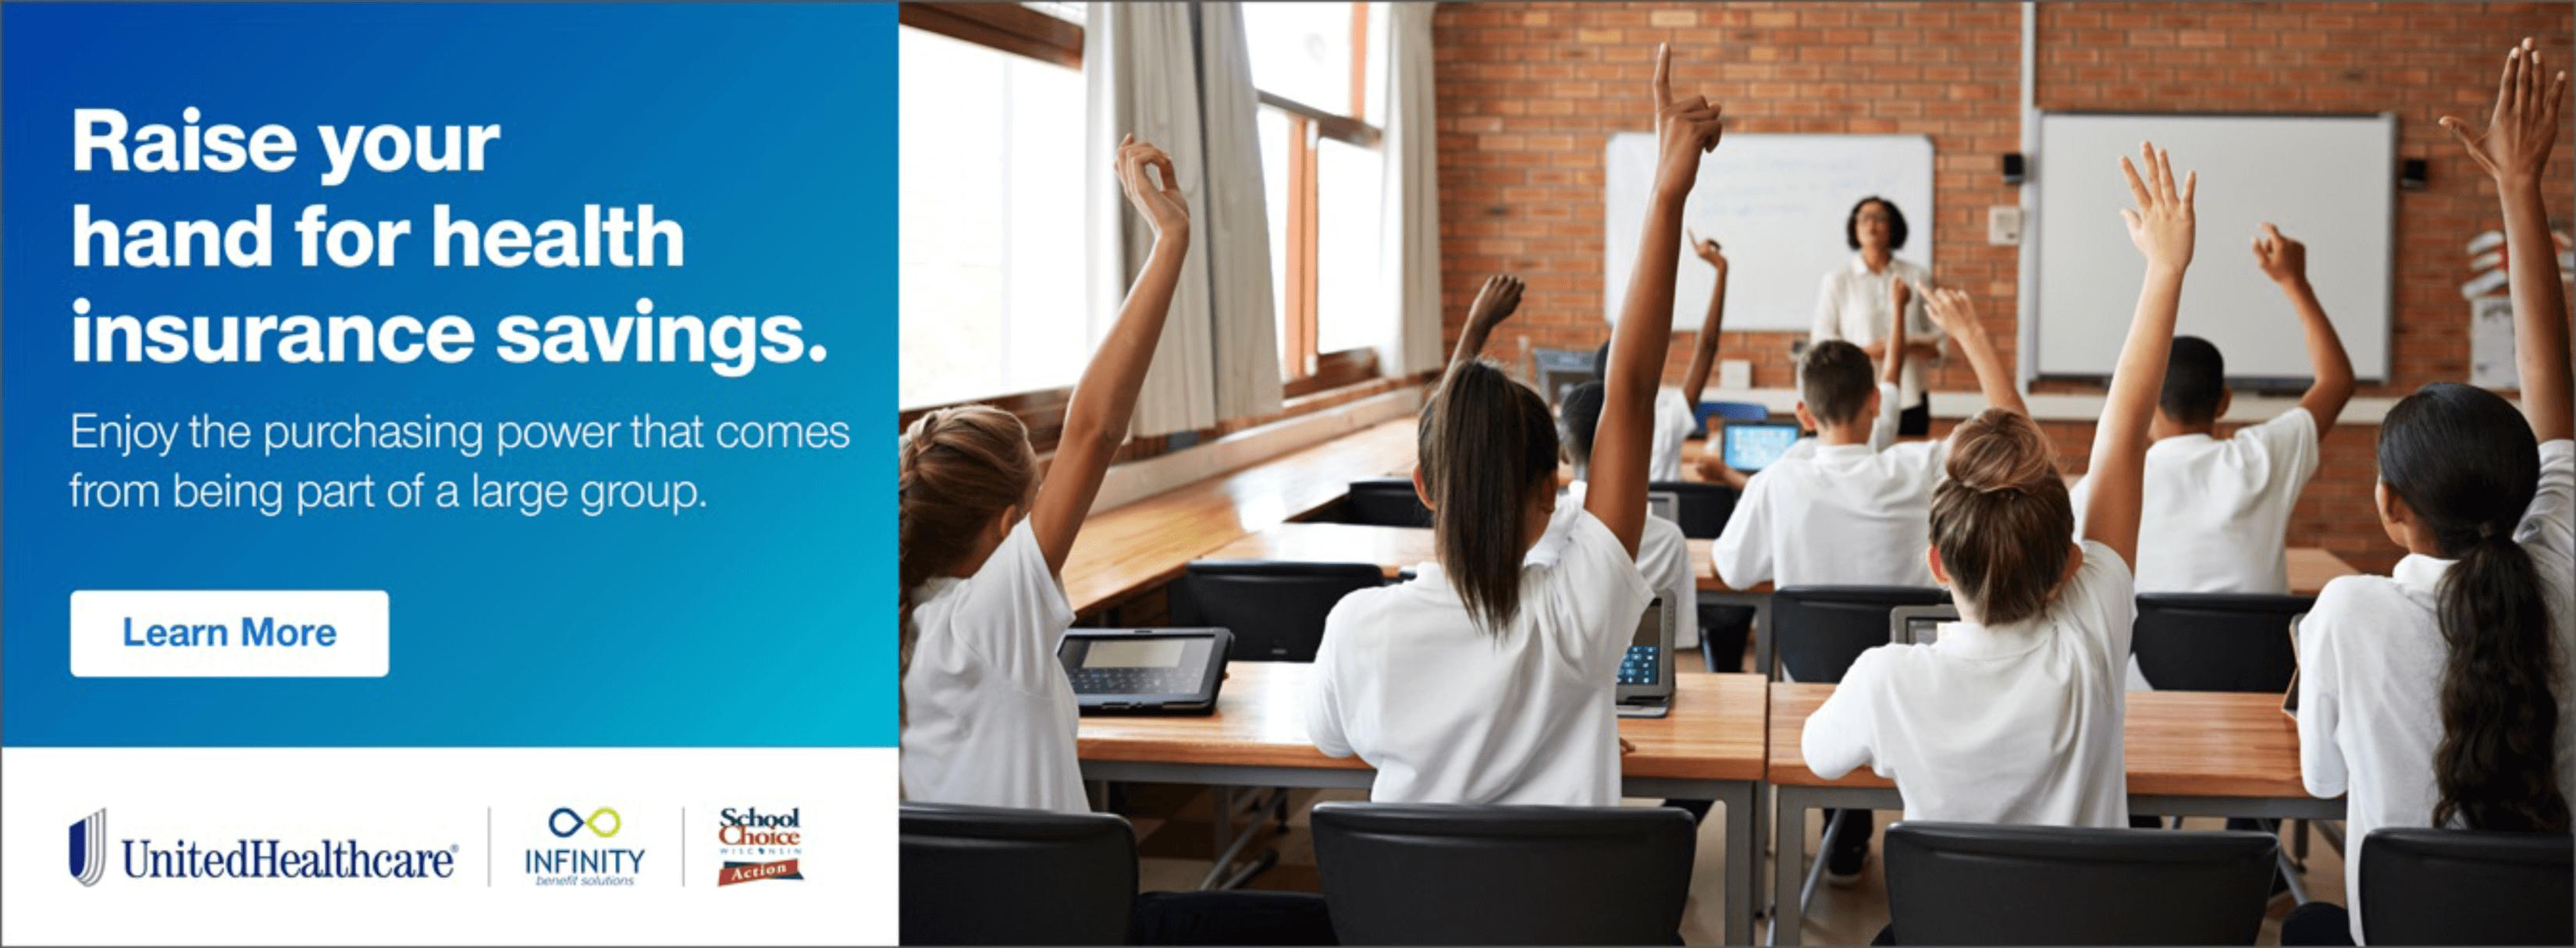 School Choice Wisconsin Action Insurance Savings